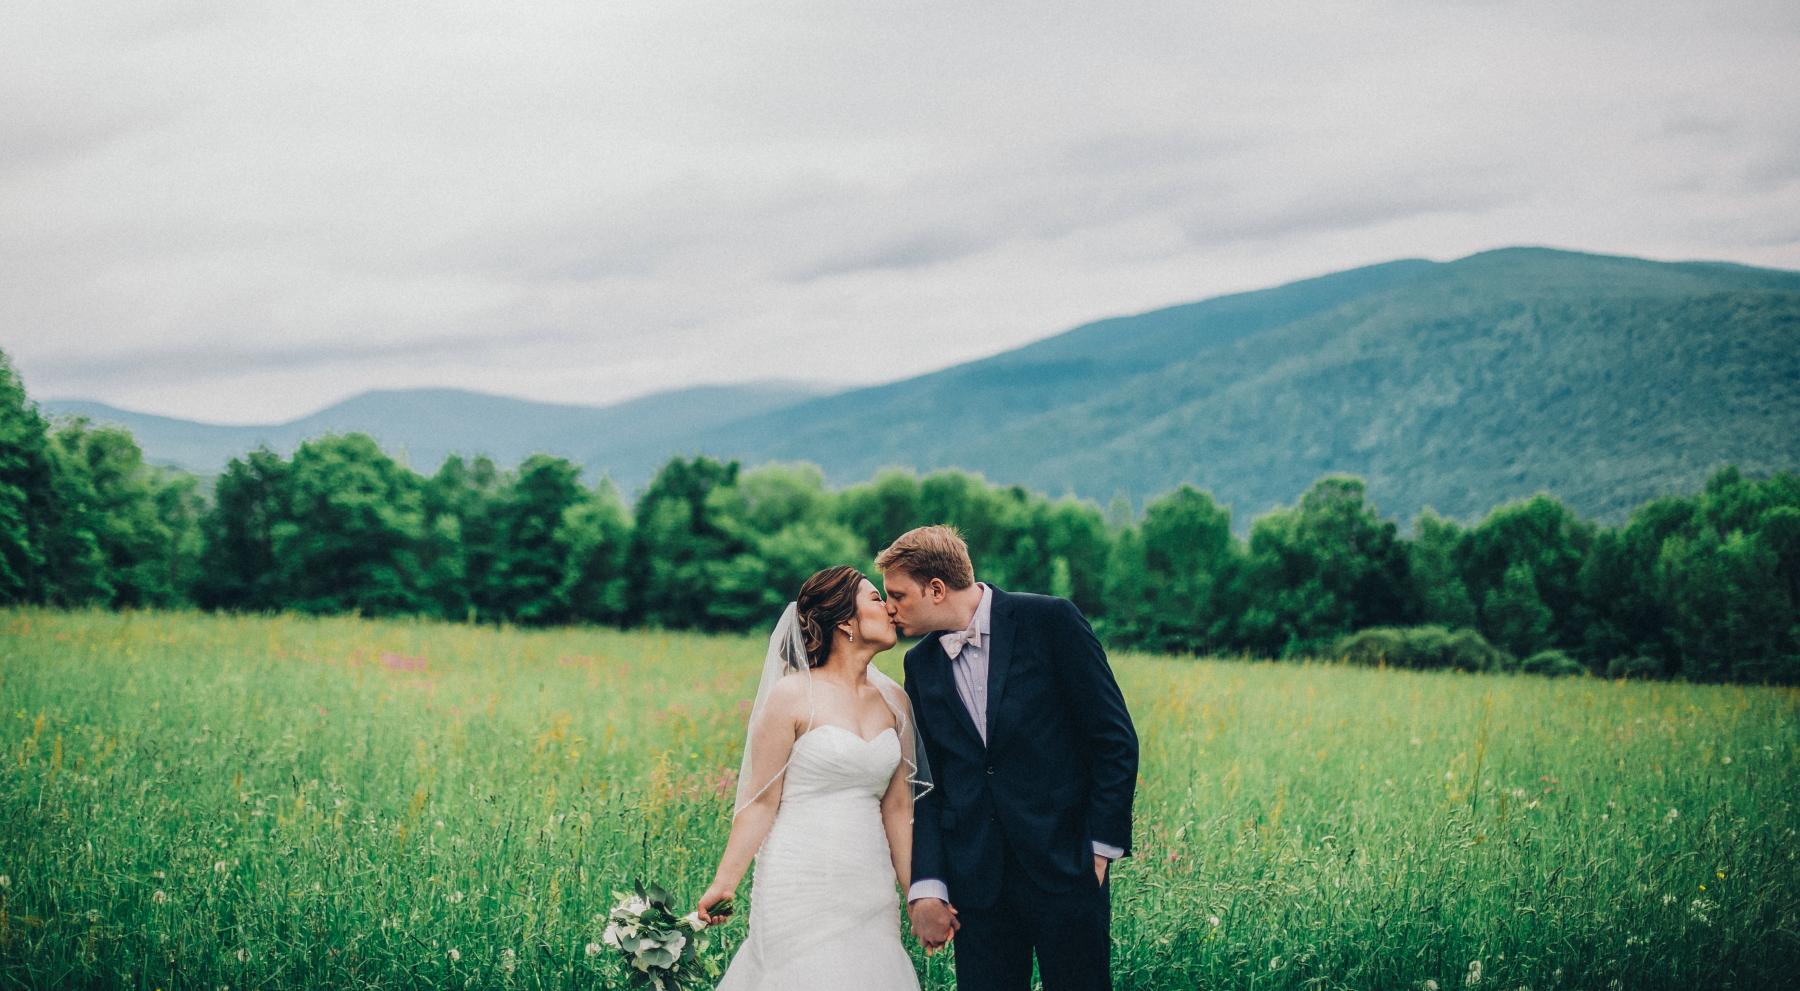 Hasol&Aaron_wedding_0628.JPG